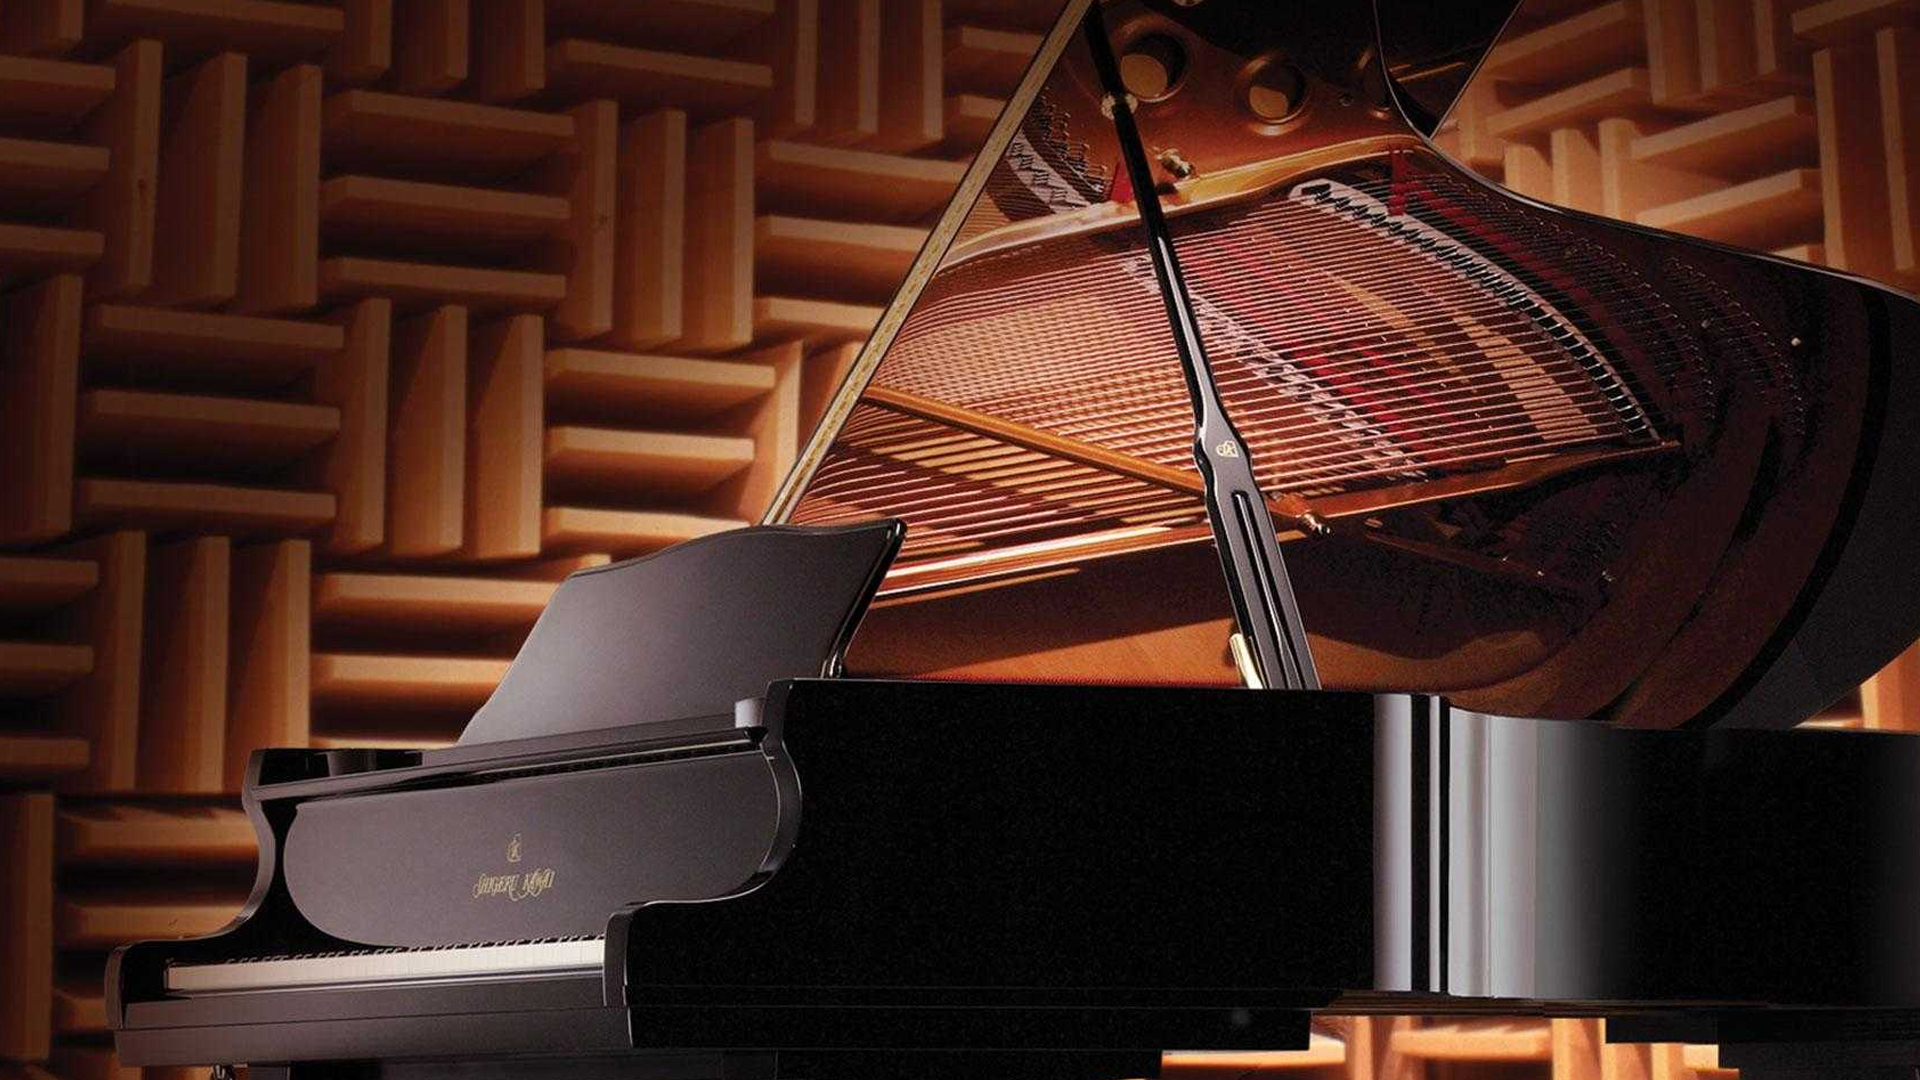 shigeru_kawai_piano2.png